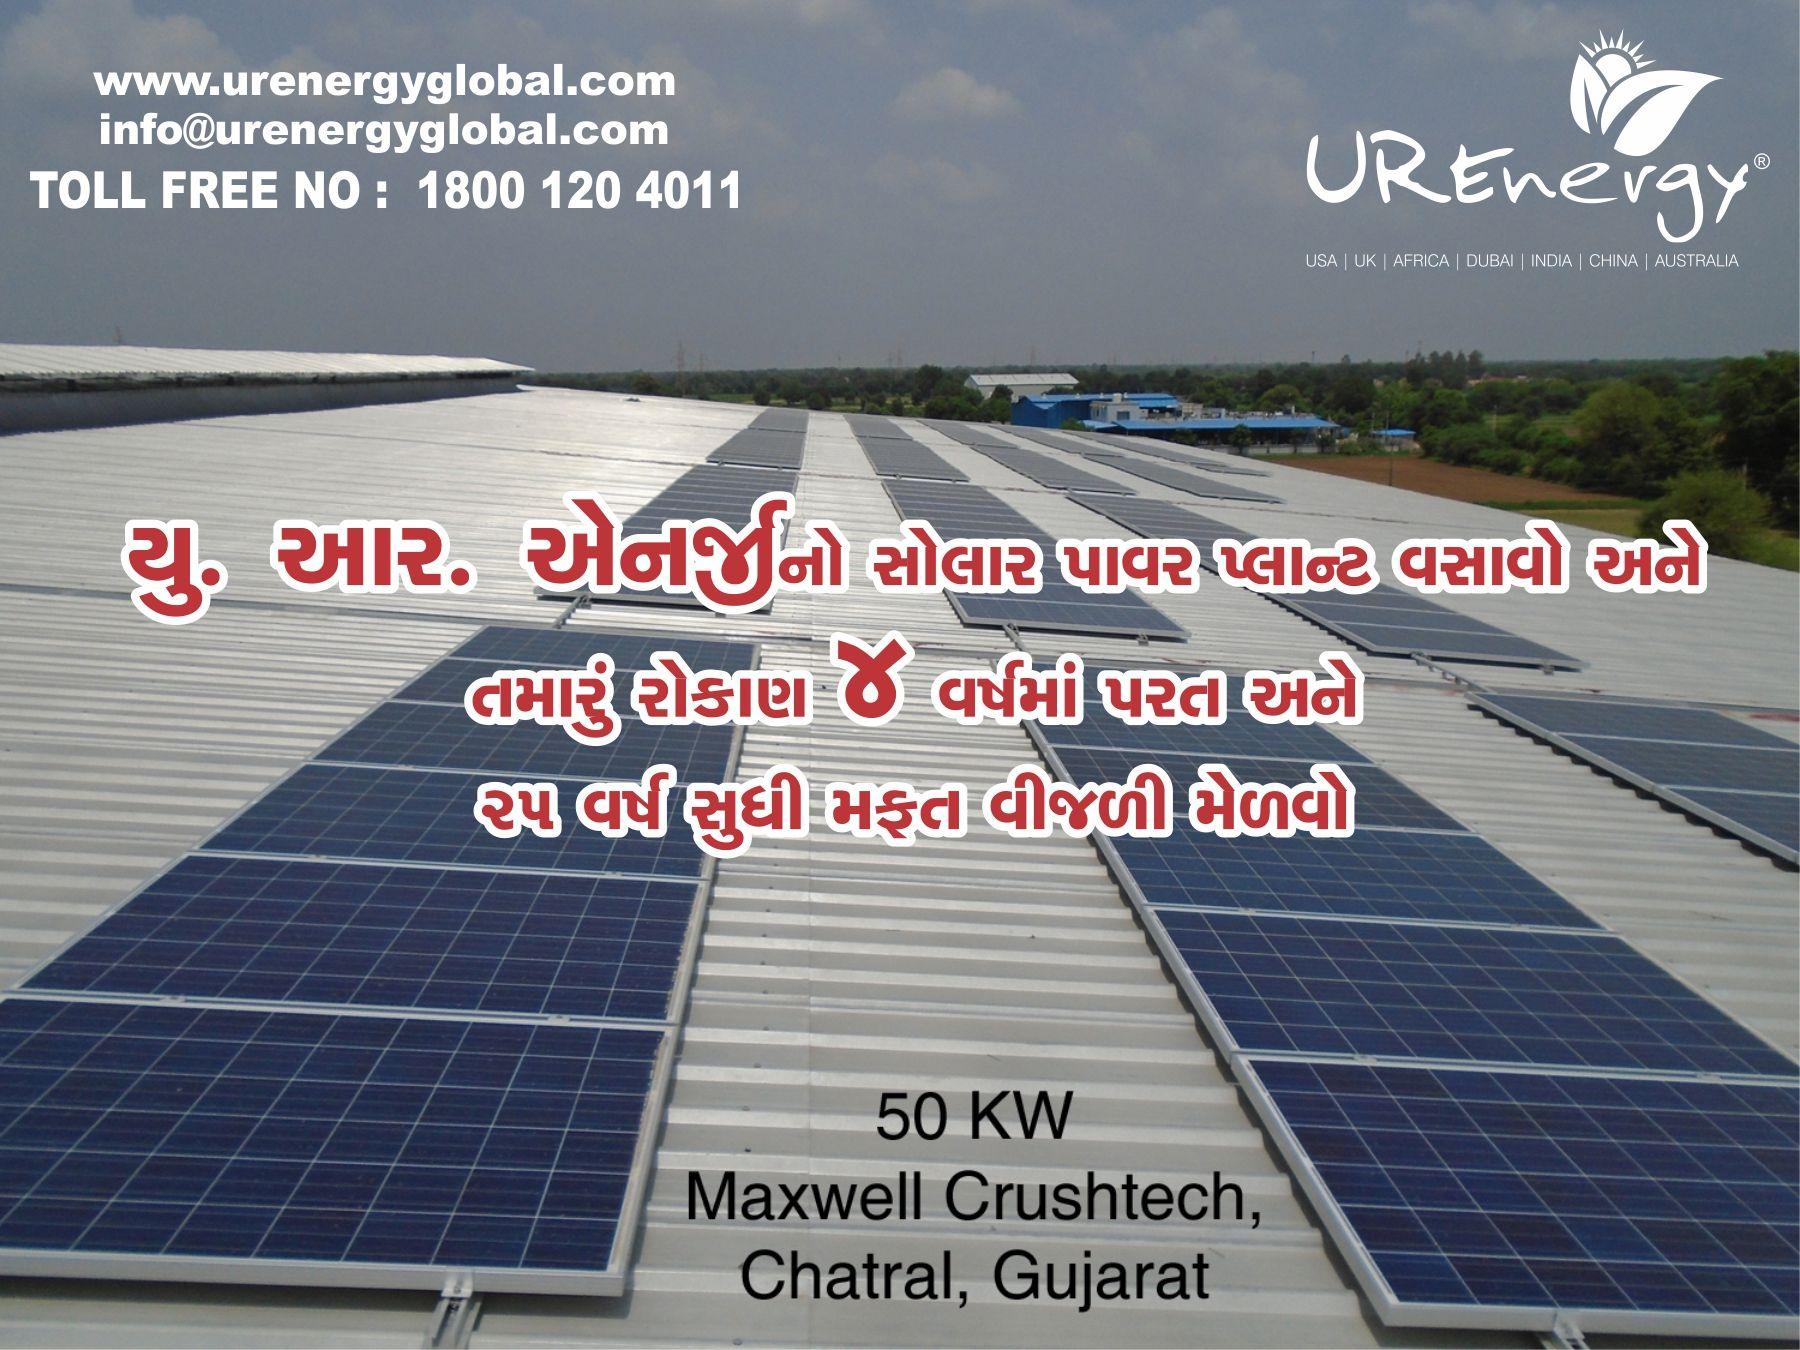 Rooftop Solar Panel Inverters Water Pump Solar Epc Gujarat India U R Energy Solar Solar Water Pump Solar Projects